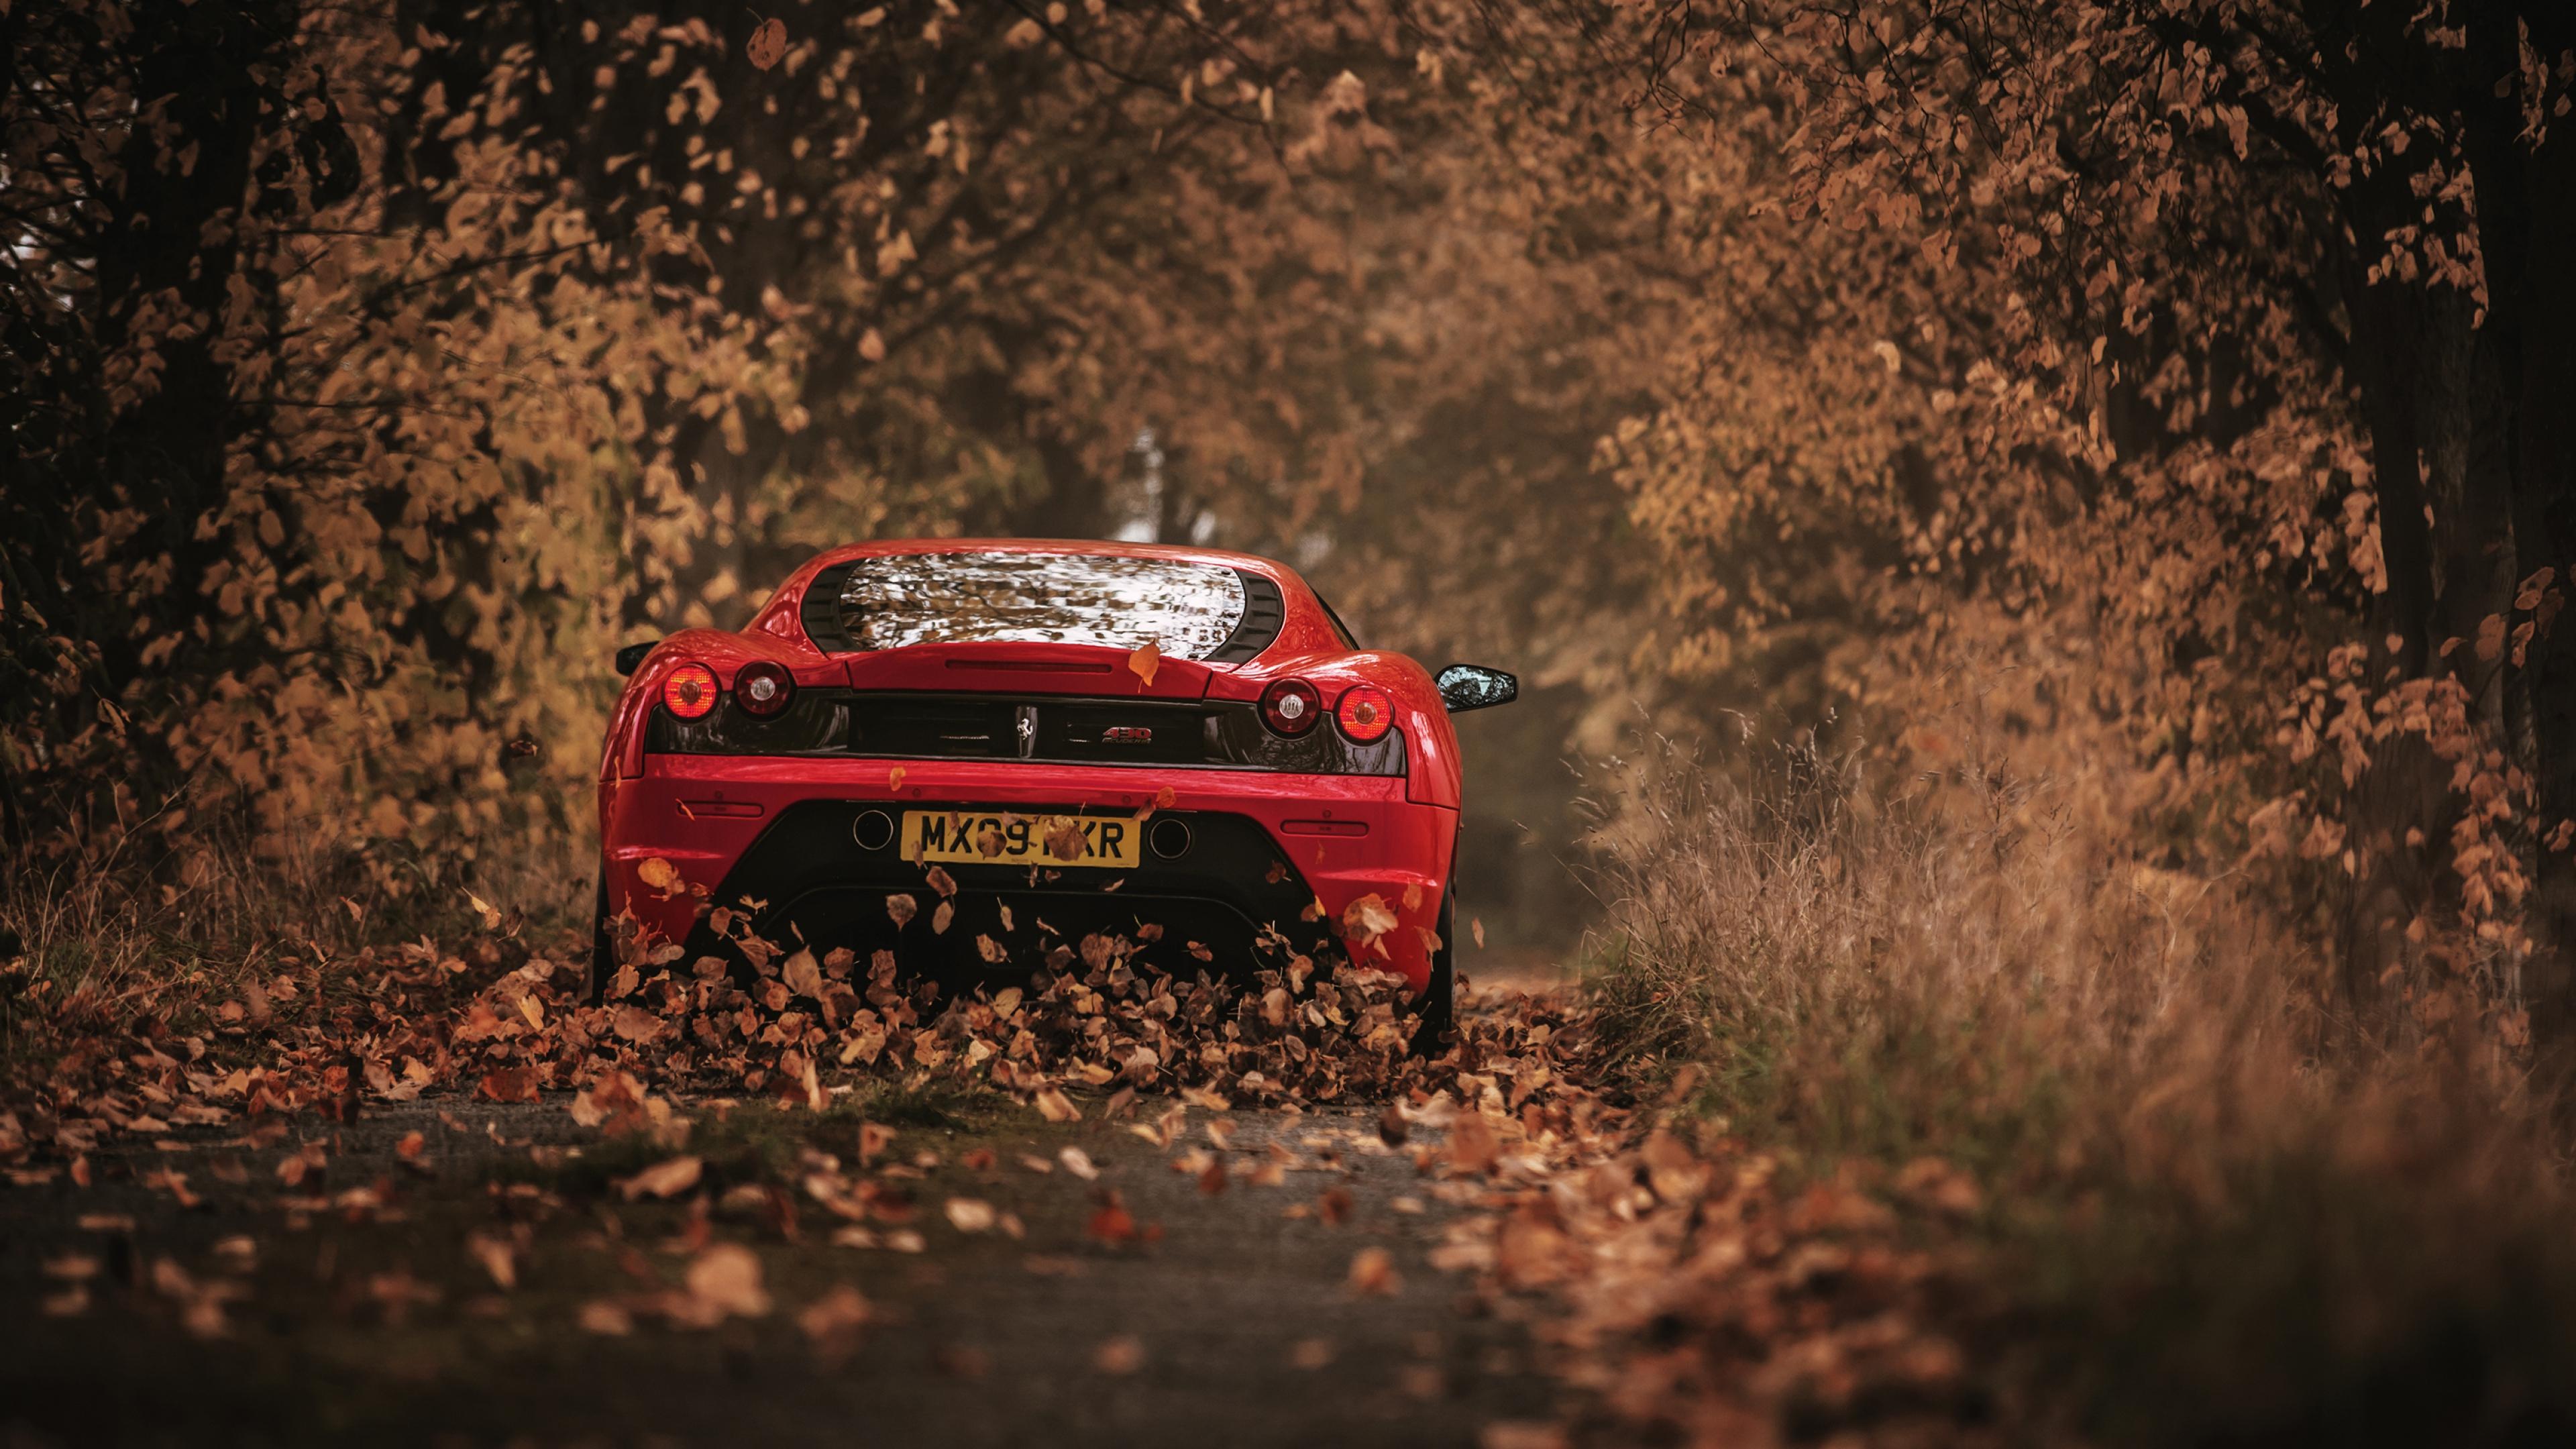 Fall Typography Laptop Wallpaper Scuderia Ferrari Hd Cars 4k Wallpapers Images